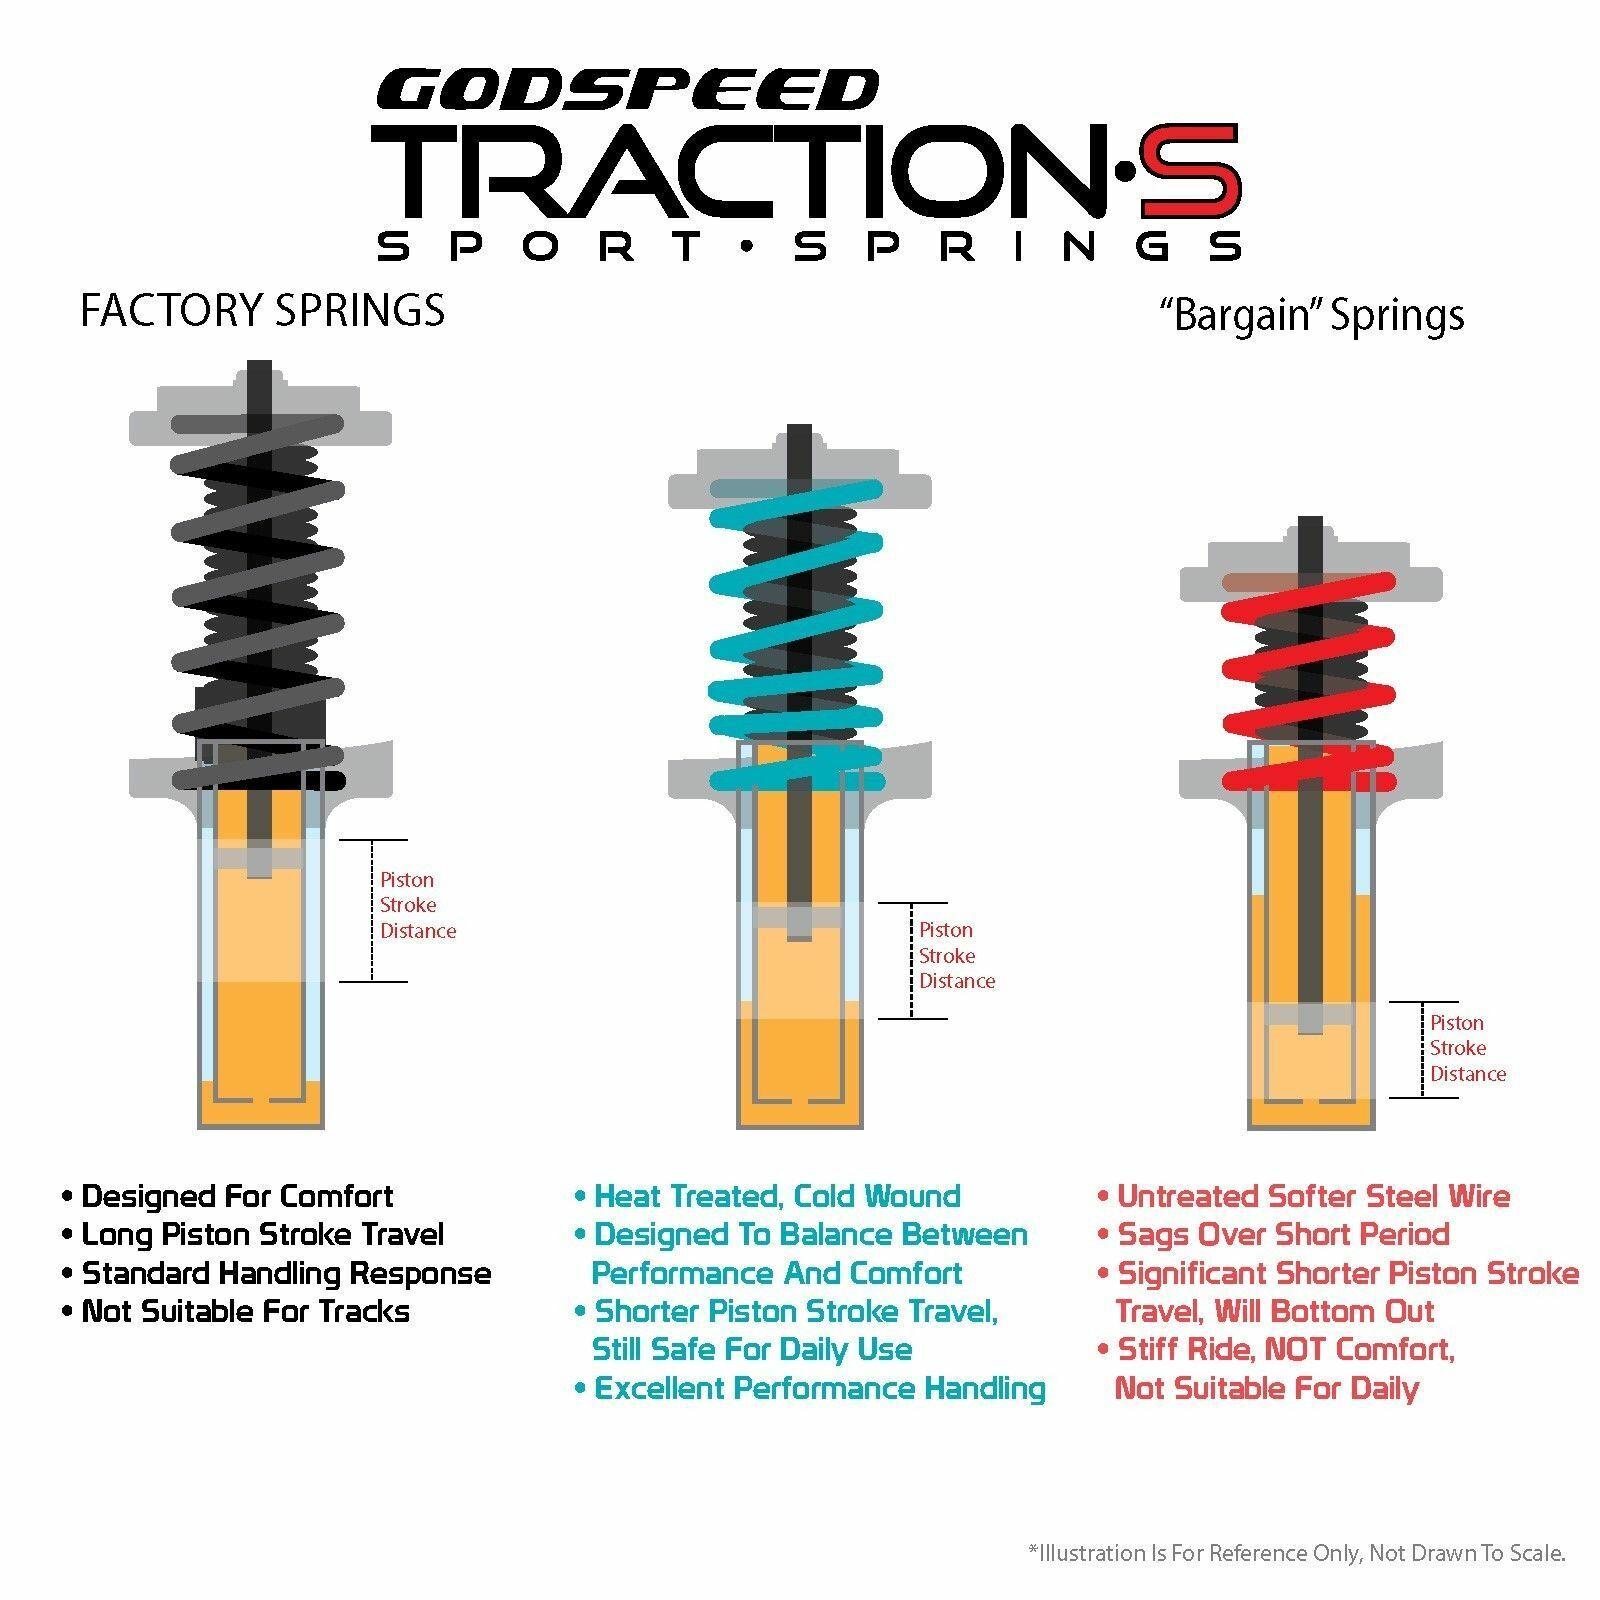 for Veloster 12-17 Lowering Springs Godspeed Traction-S Sport Springs